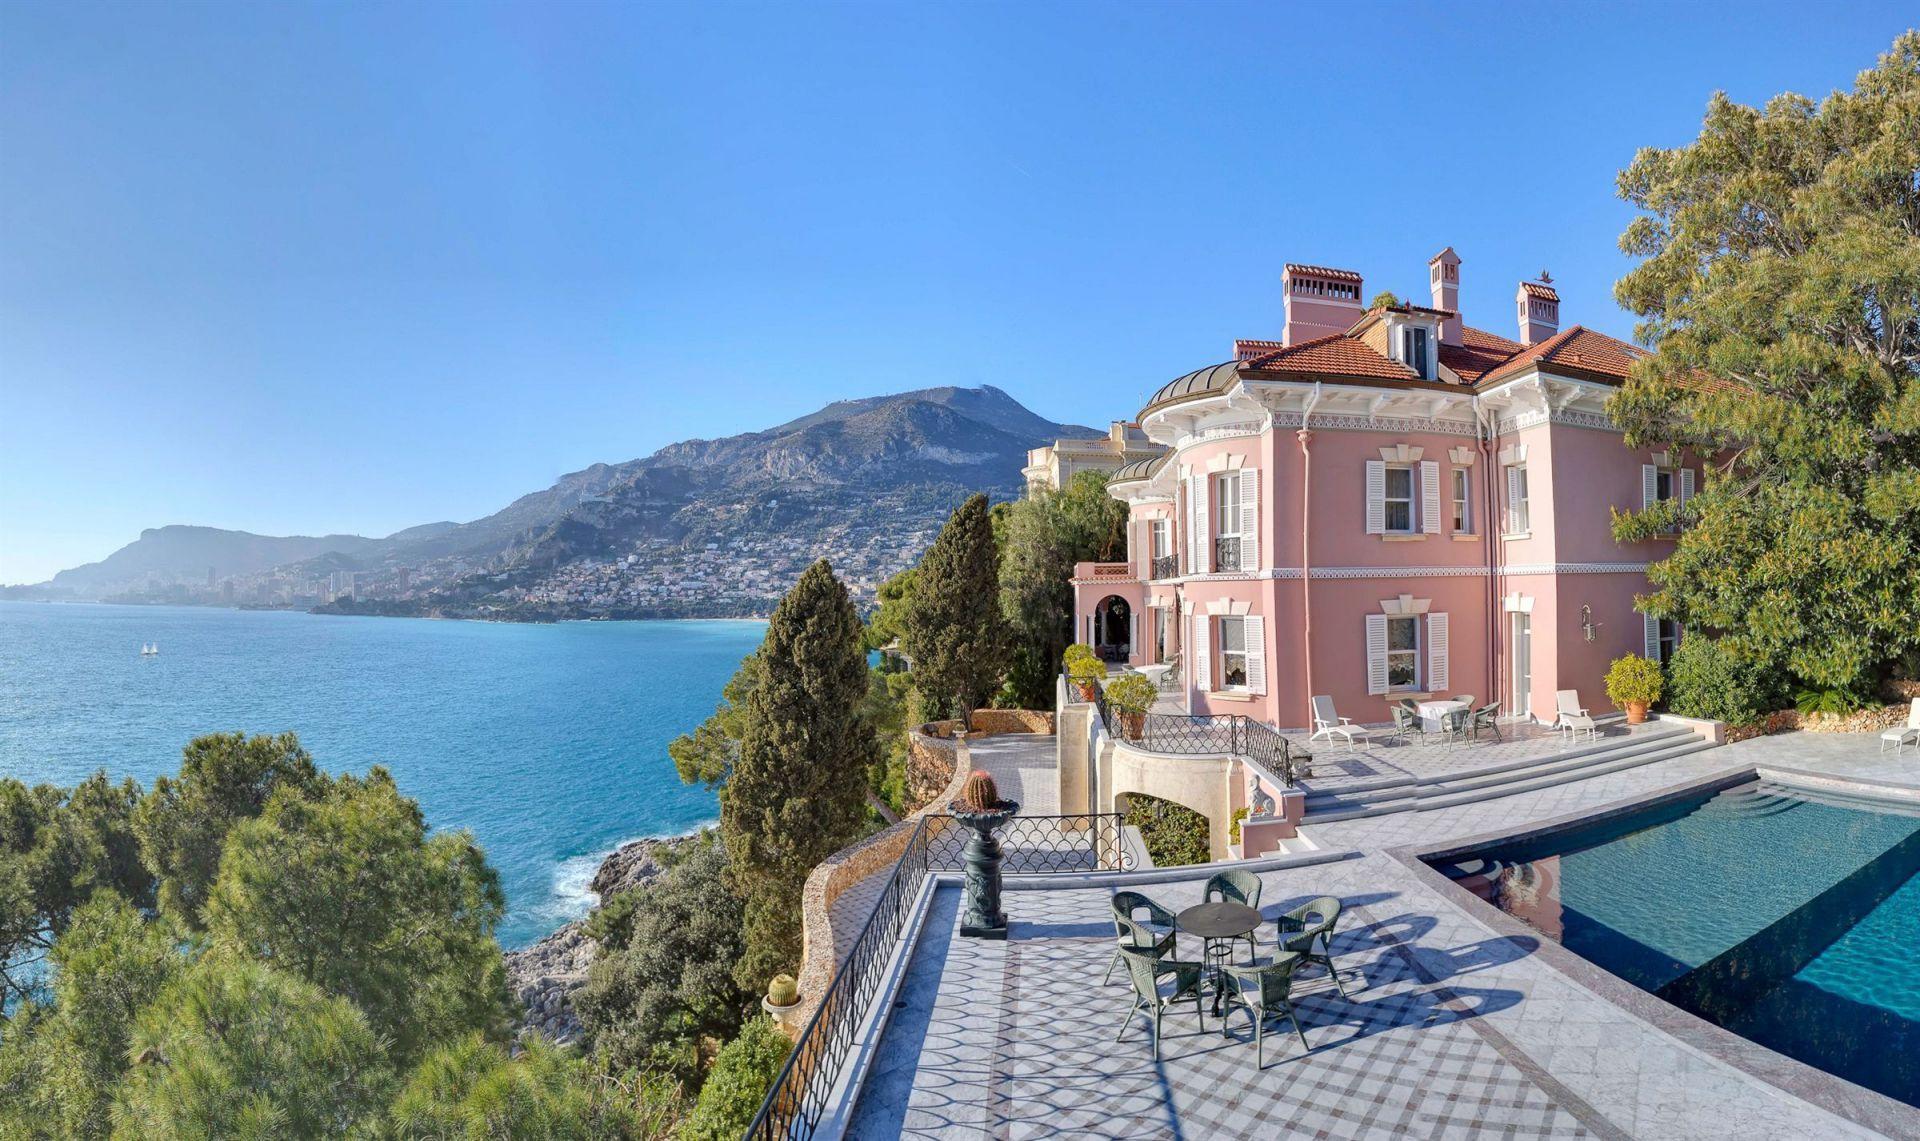 Monaco Living Travel Europe Homes Luxury Homes Lifestyle Property Market  Hugh Wade Jones Enness